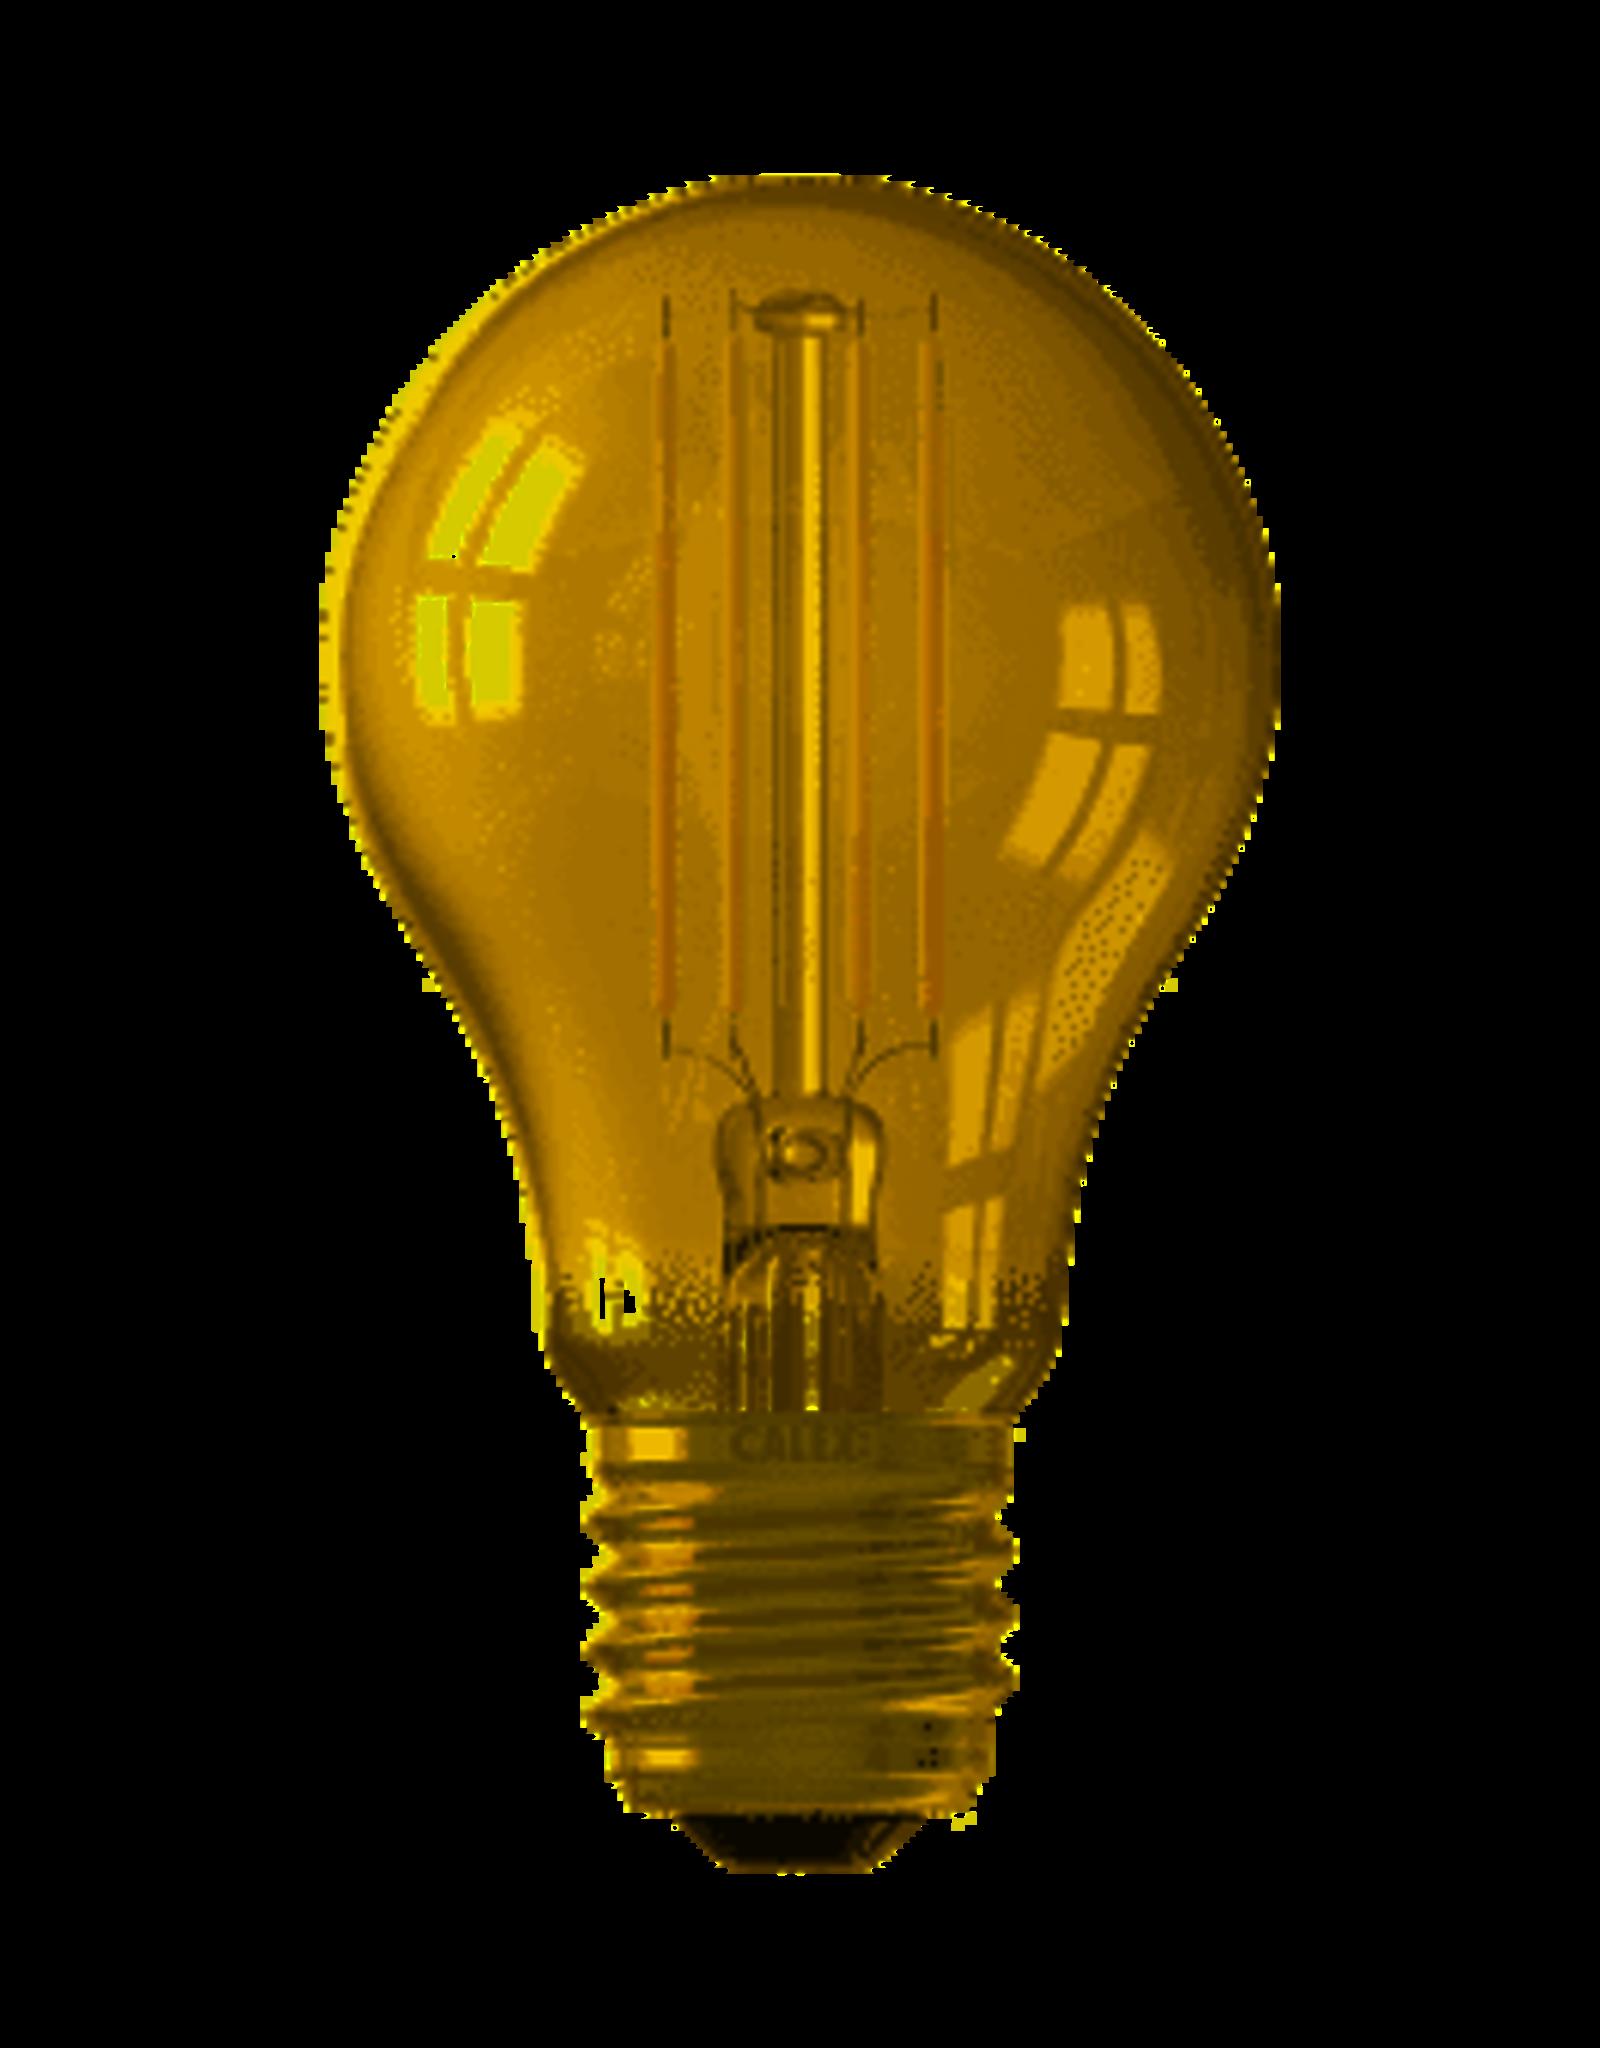 Calex Calex Smart LED Filament Goud Standaardlamp A60 E27 220-240V 7W 806lm 1800-3000K